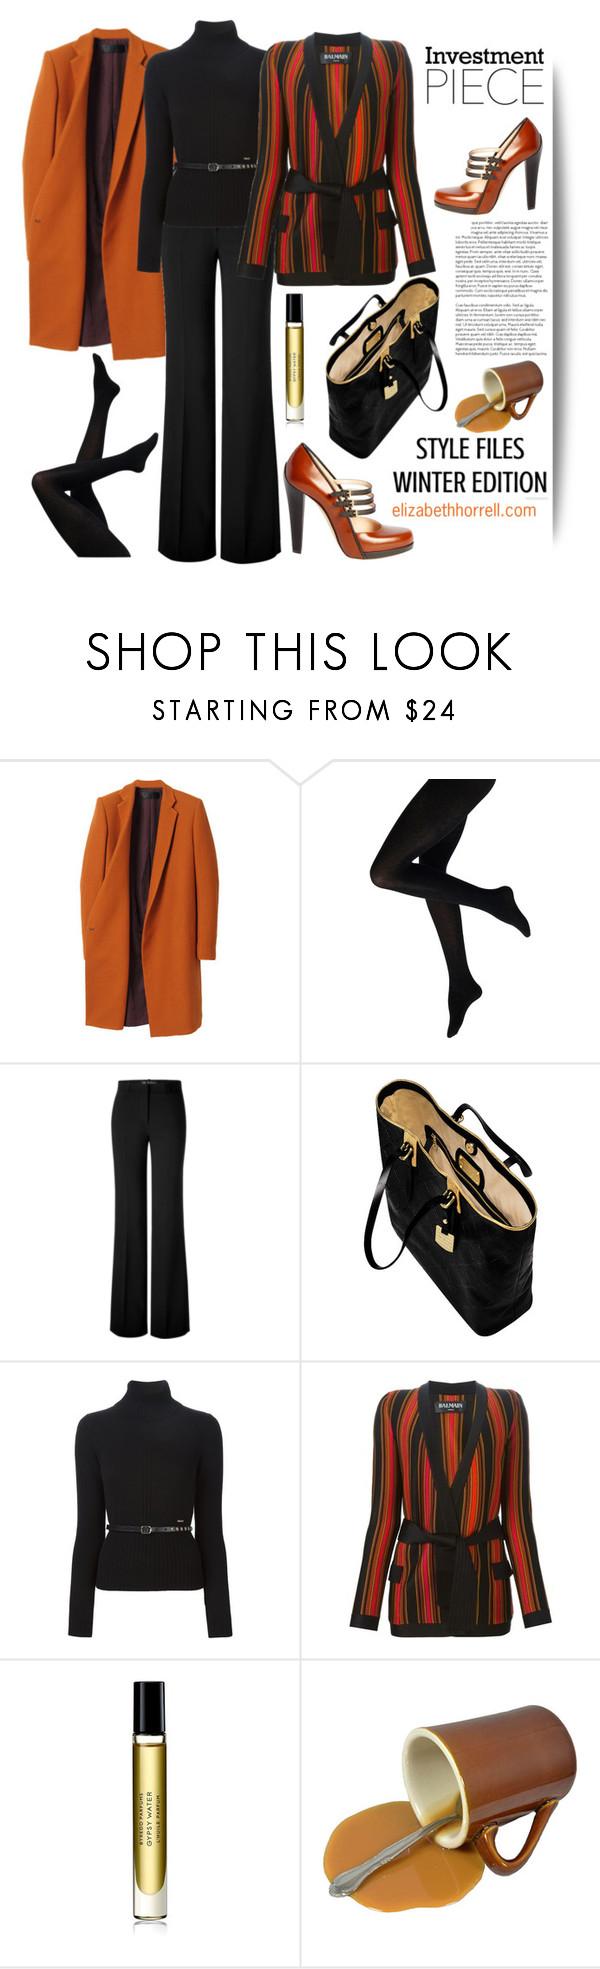 """LIZ"" by elizabethhorrell ❤ liked on Polyvore featuring Haider Ackermann, Versace, Longchamp, Dsquared2, Balmain, Byredo, women's clothing, women's fashion, women and female"